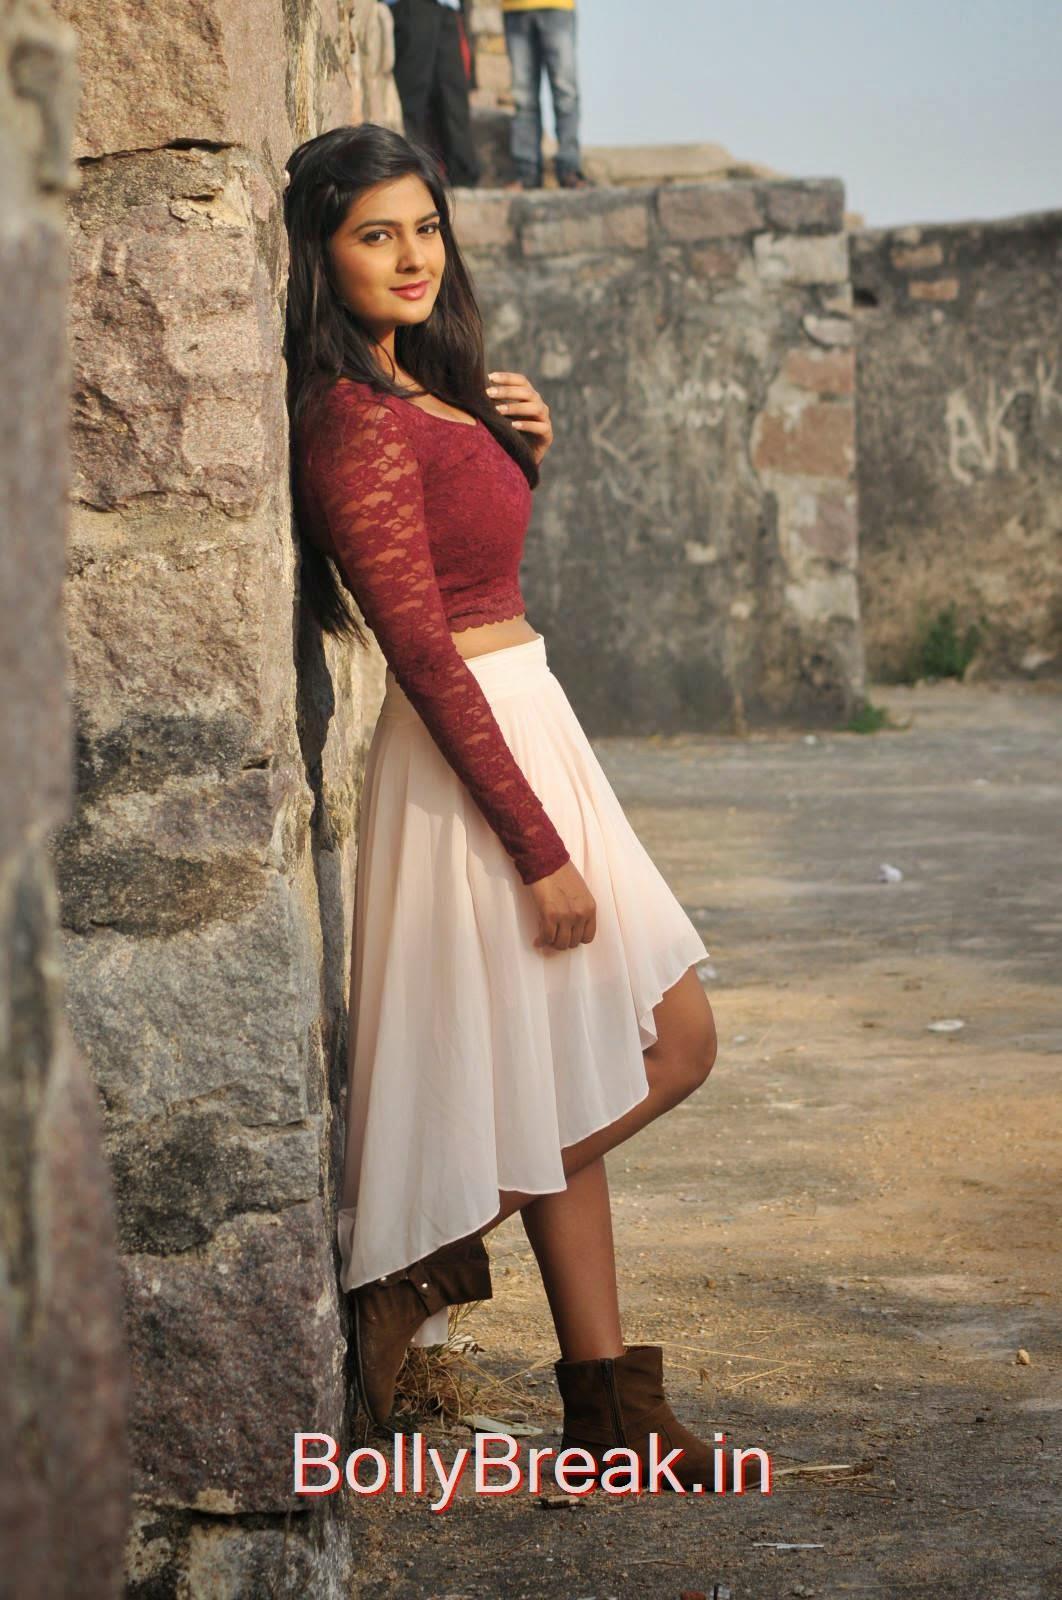 Neha Deshpande Unseen Stills, Actress Neha Deshpande Hot HD Stills from The Bells Movie